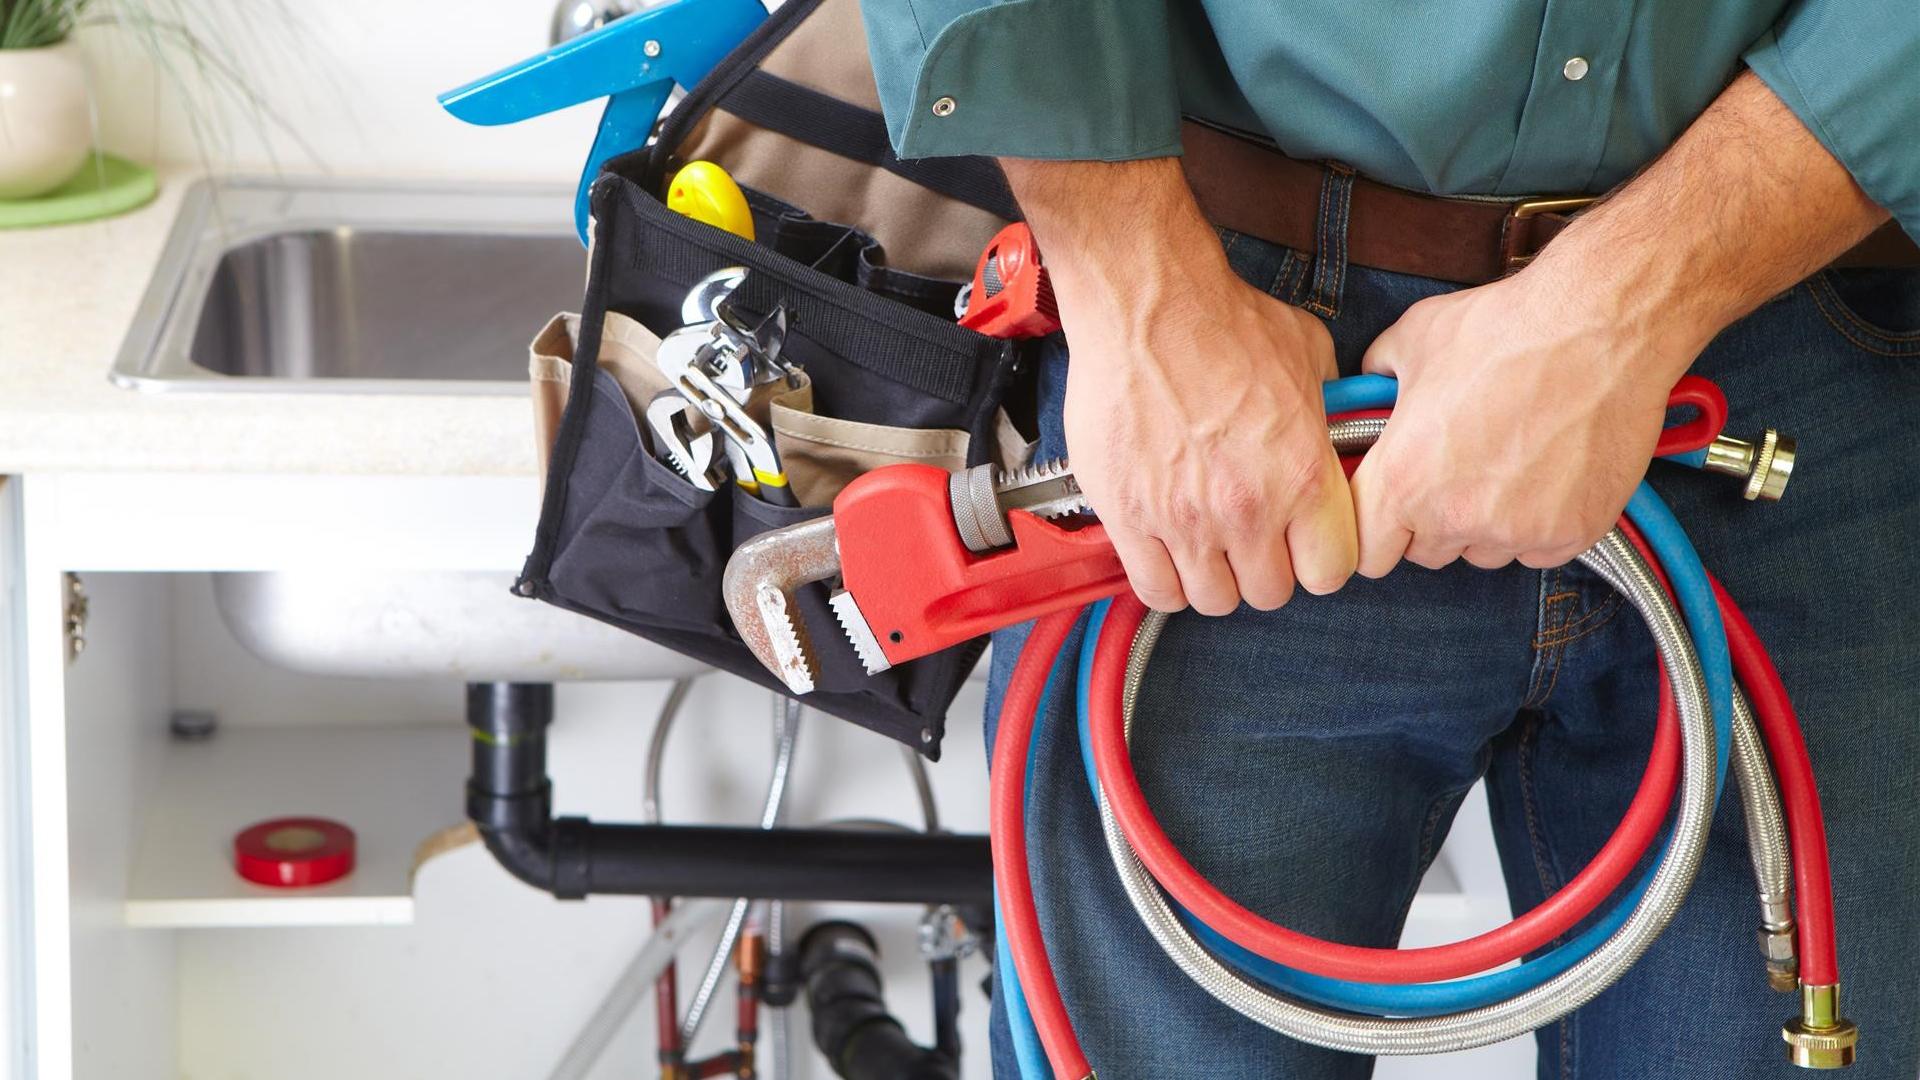 Nearest-Plumbing-Service